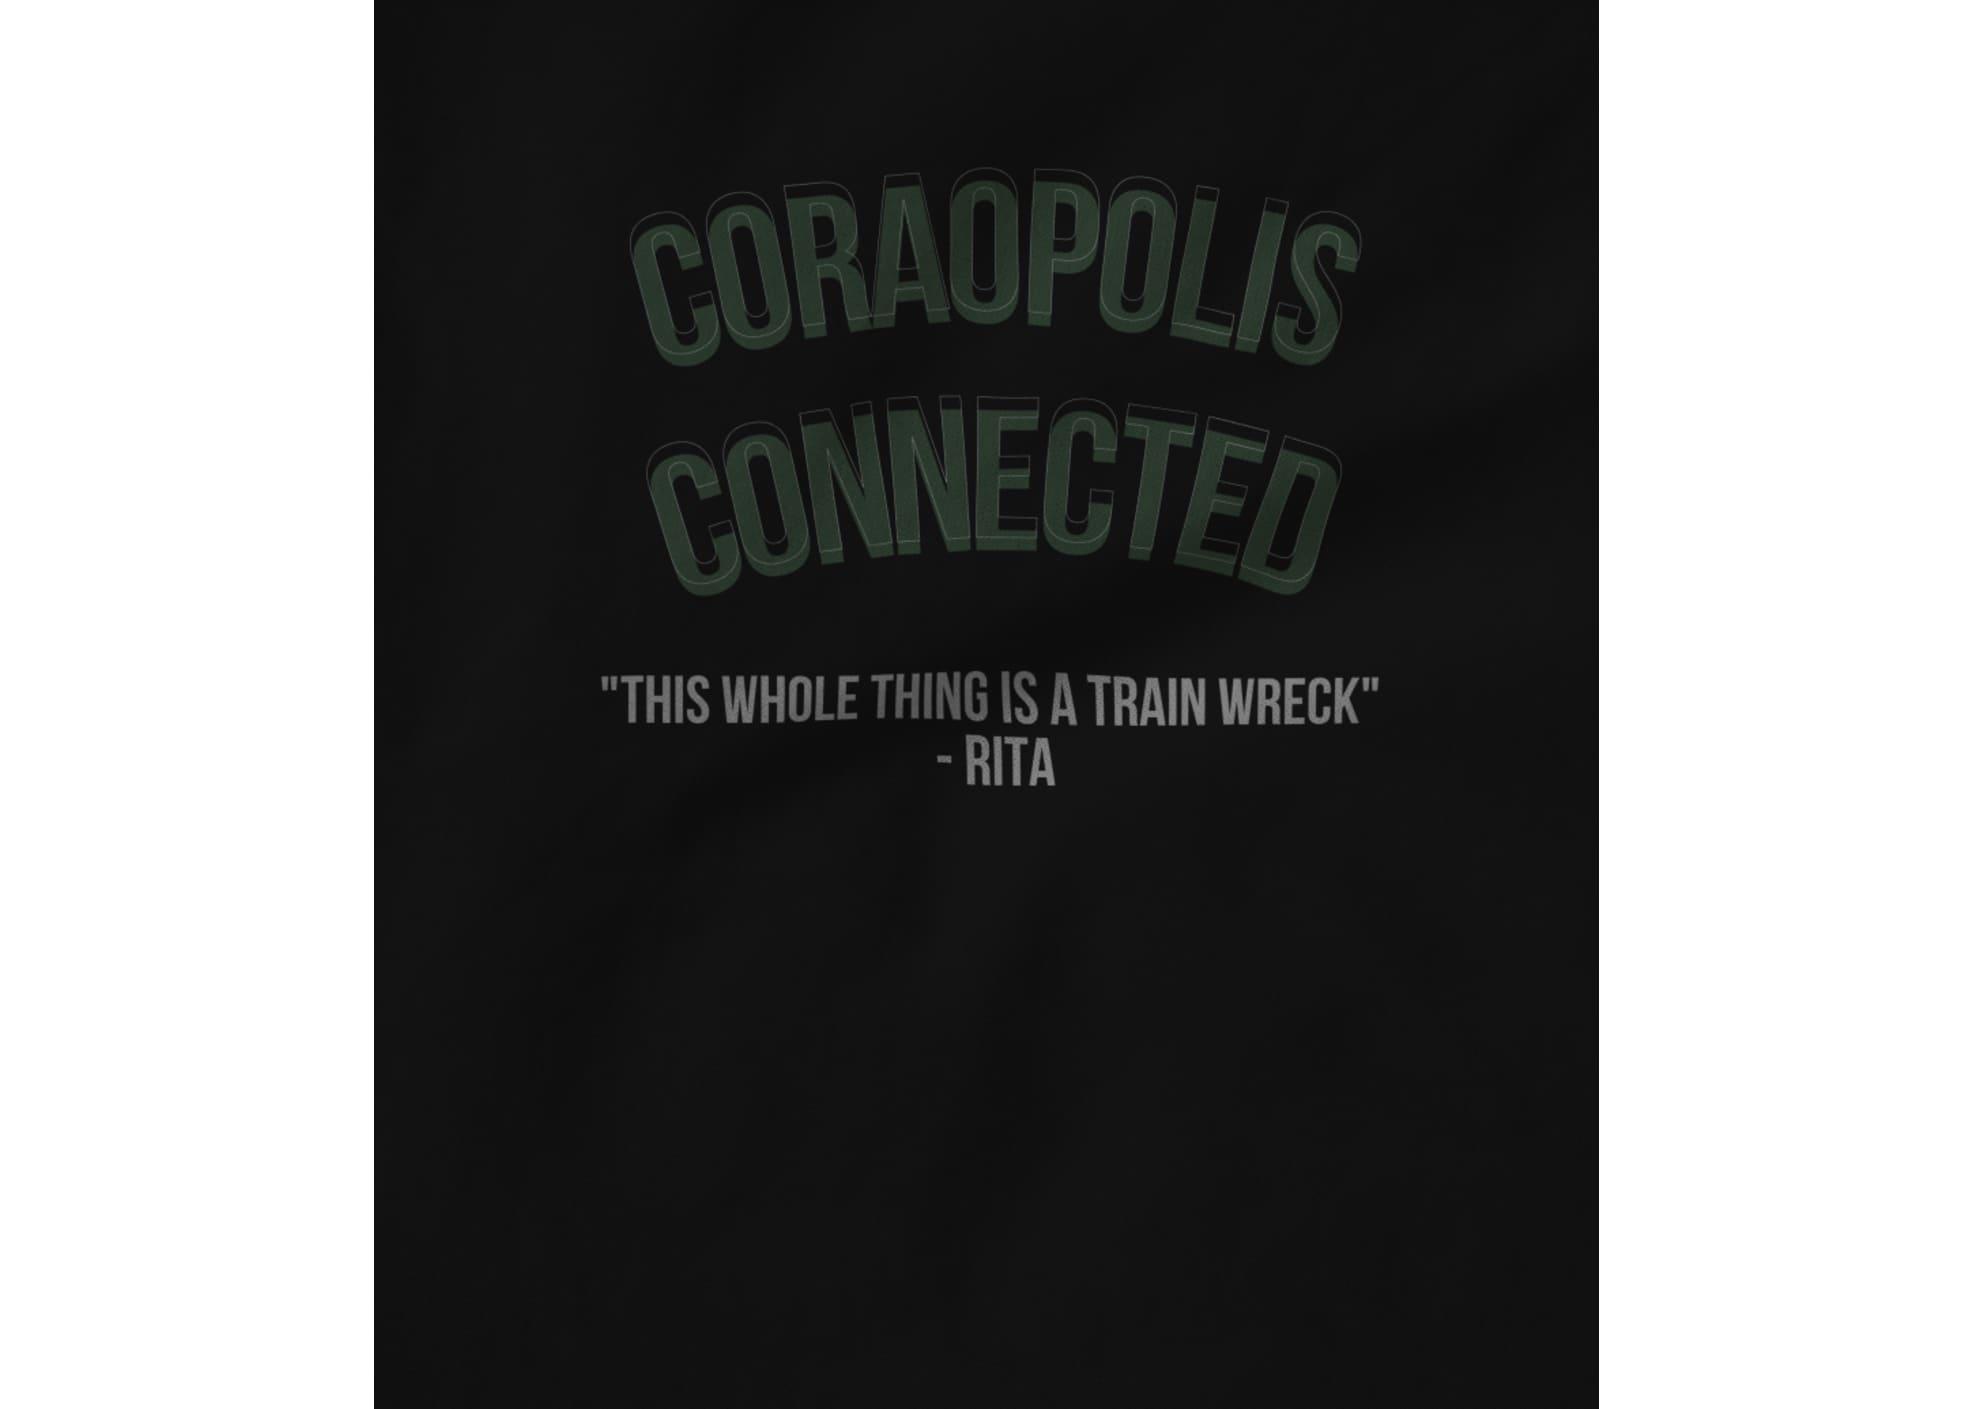 Coraopolis connected train wreck 1627756510